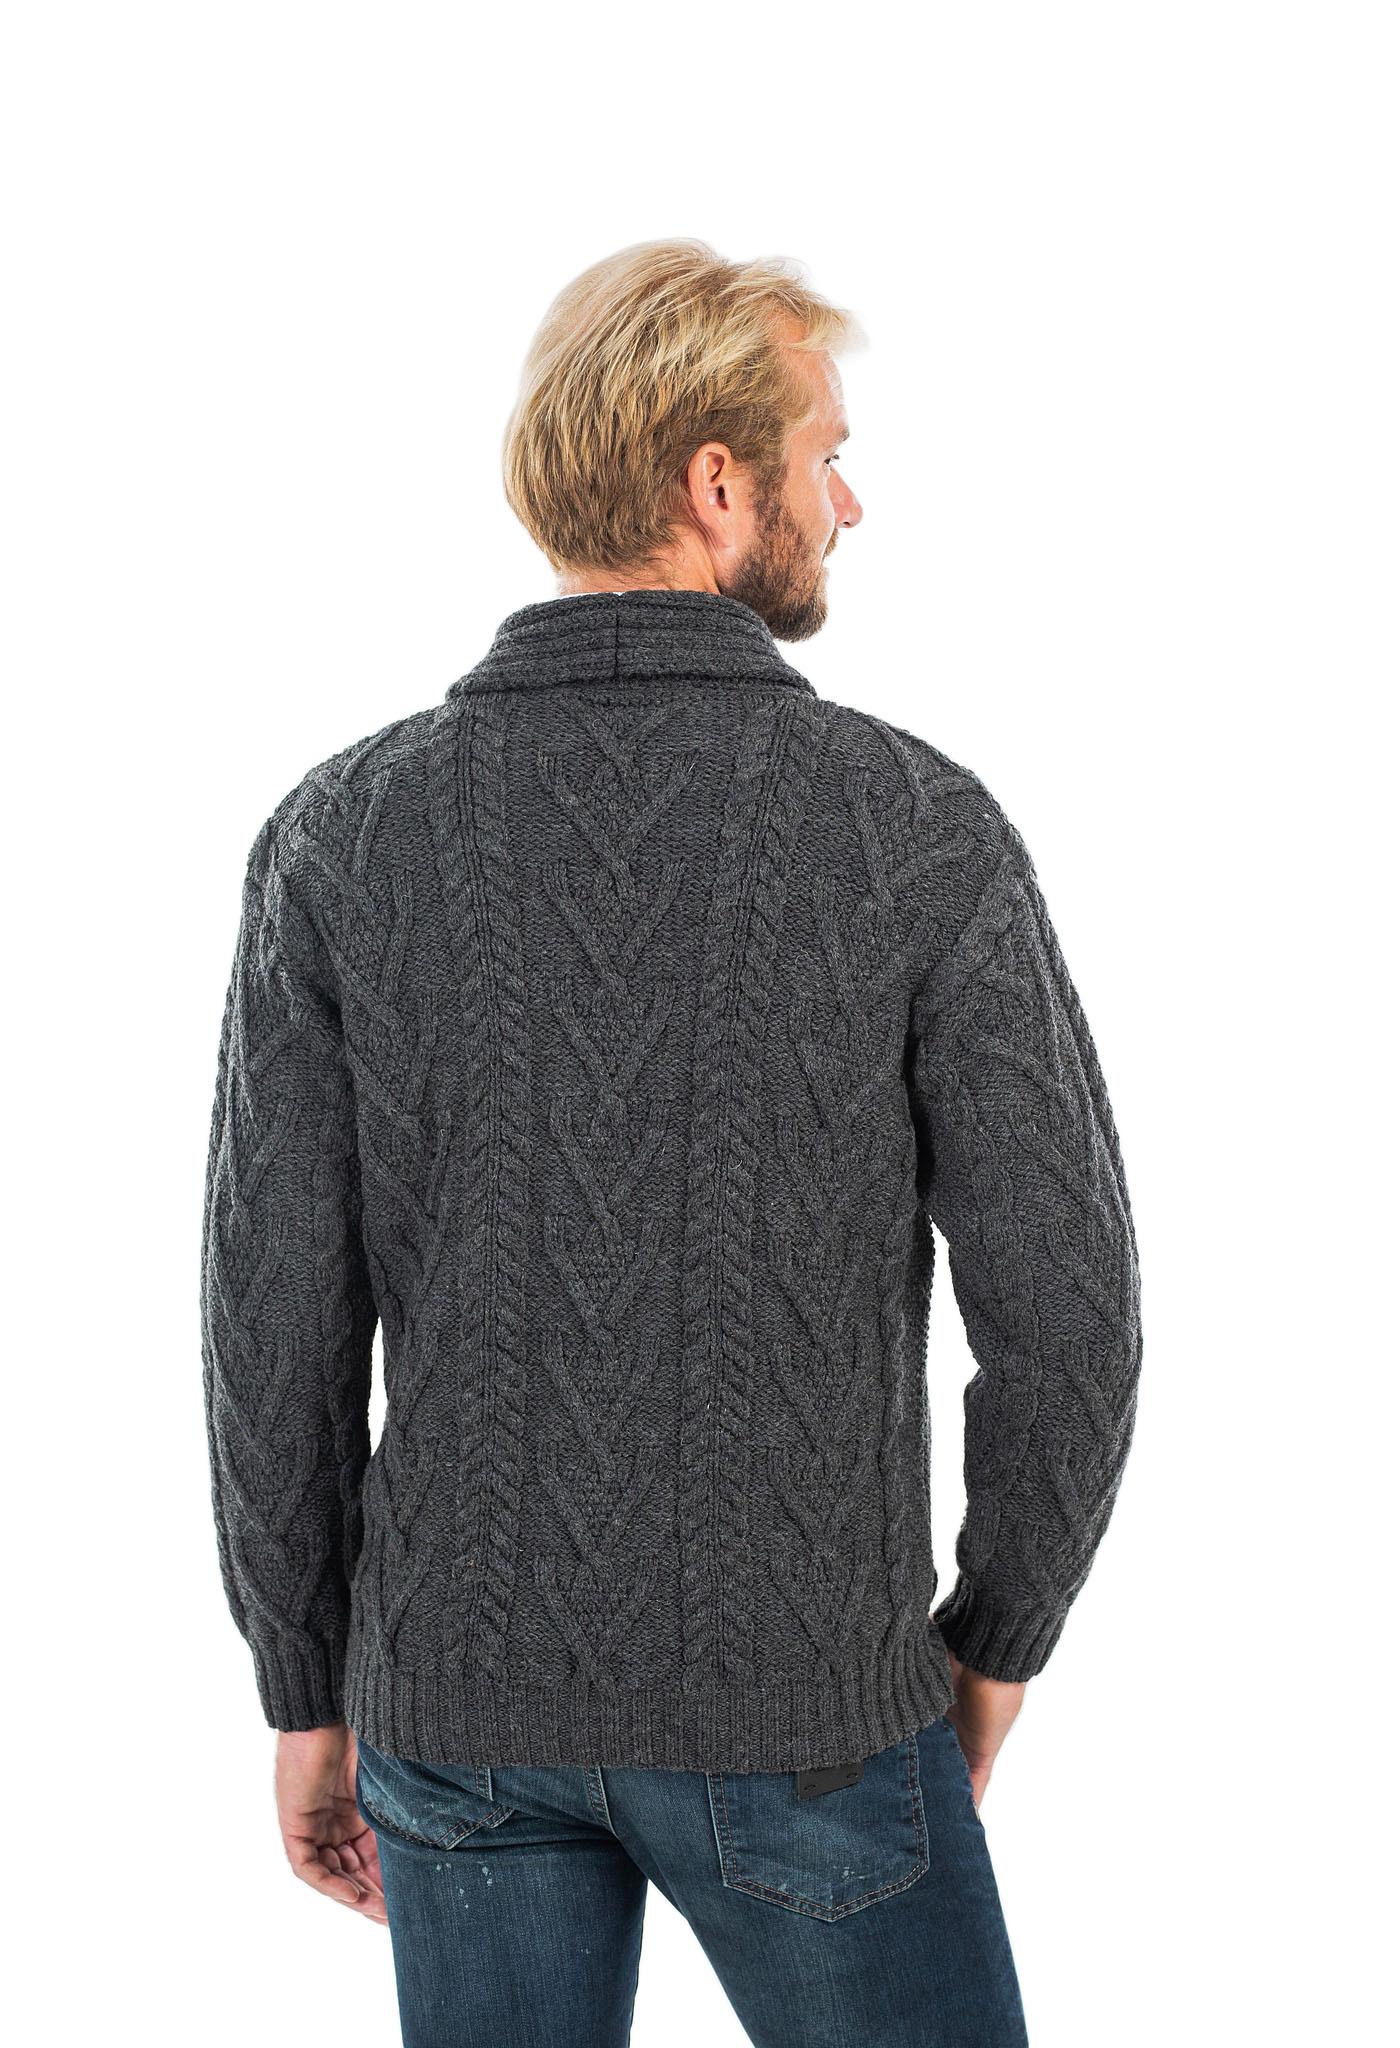 SAOL-Mens-Irish-Merino-Wool-Cardigan-Shawl-Collar-Front-Pockets-Aran-Cable-Knit thumbnail 33